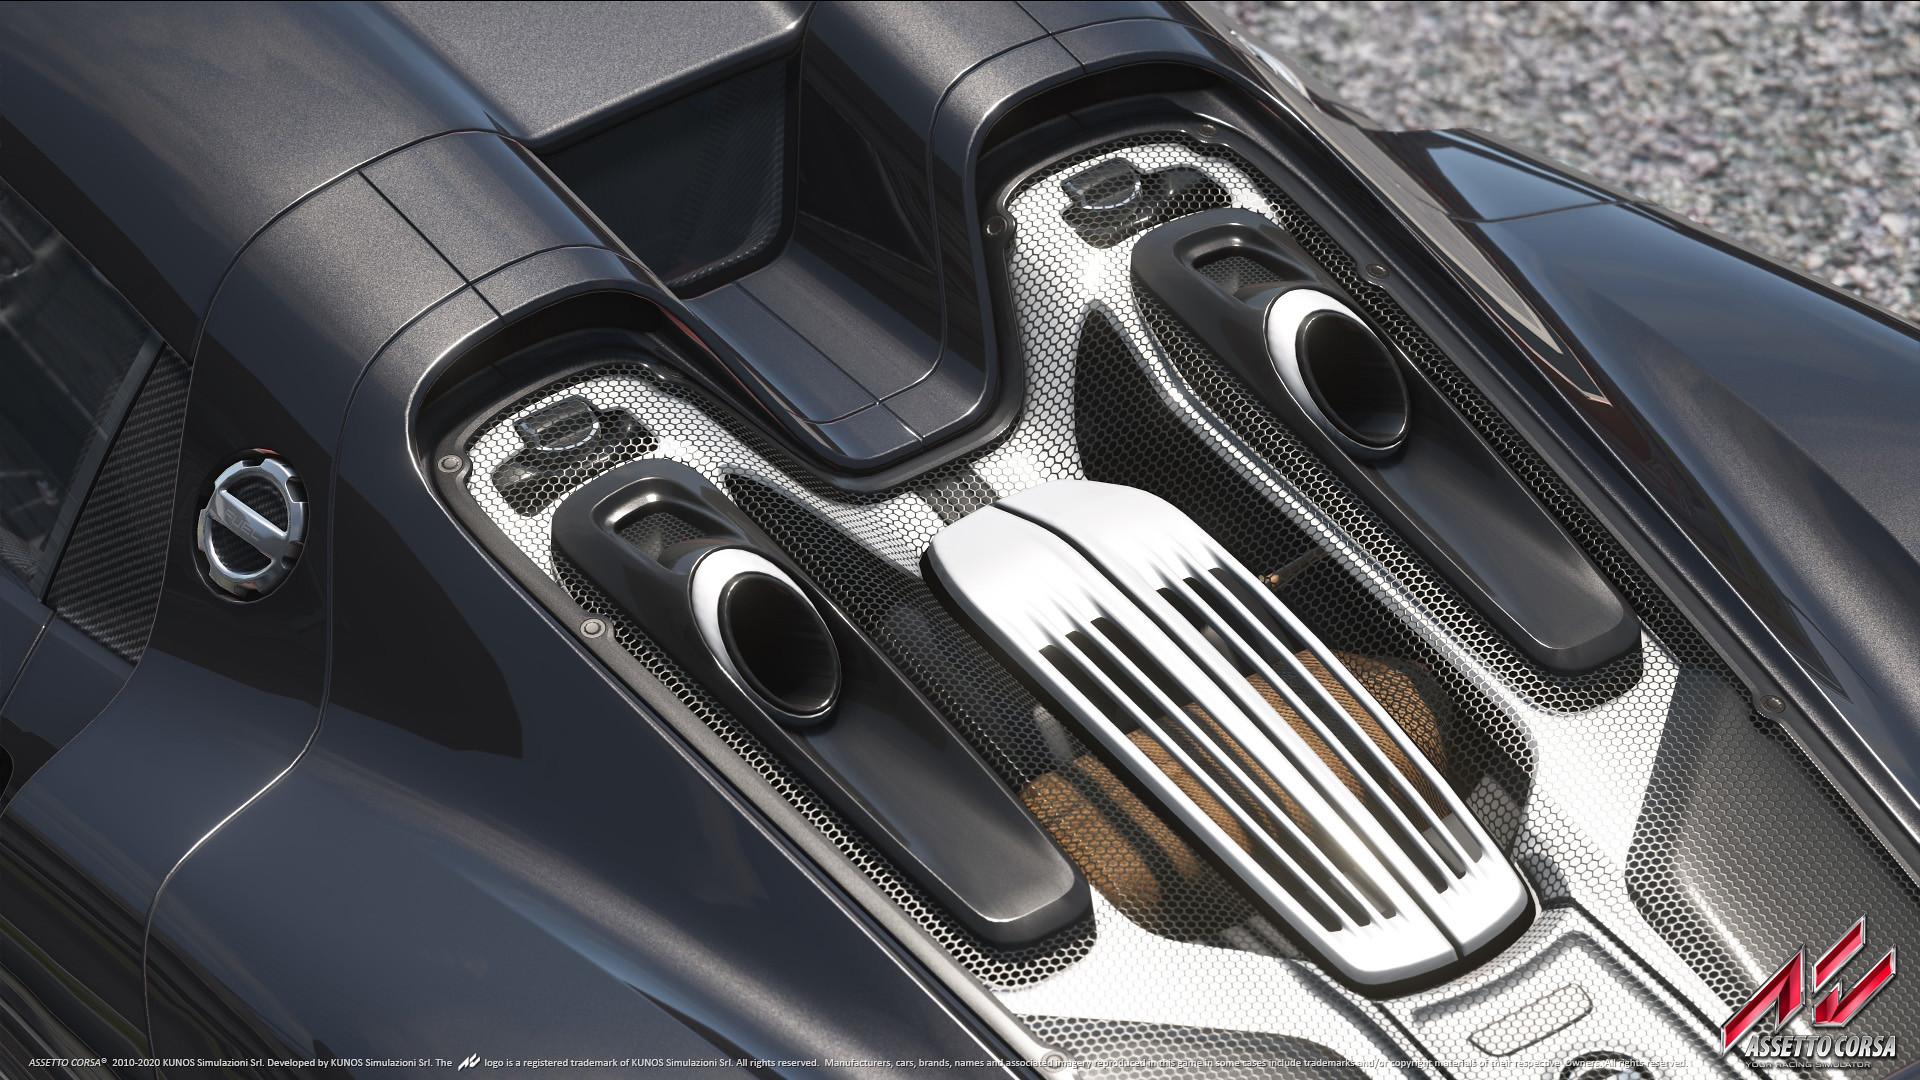 Porsche DLC 17